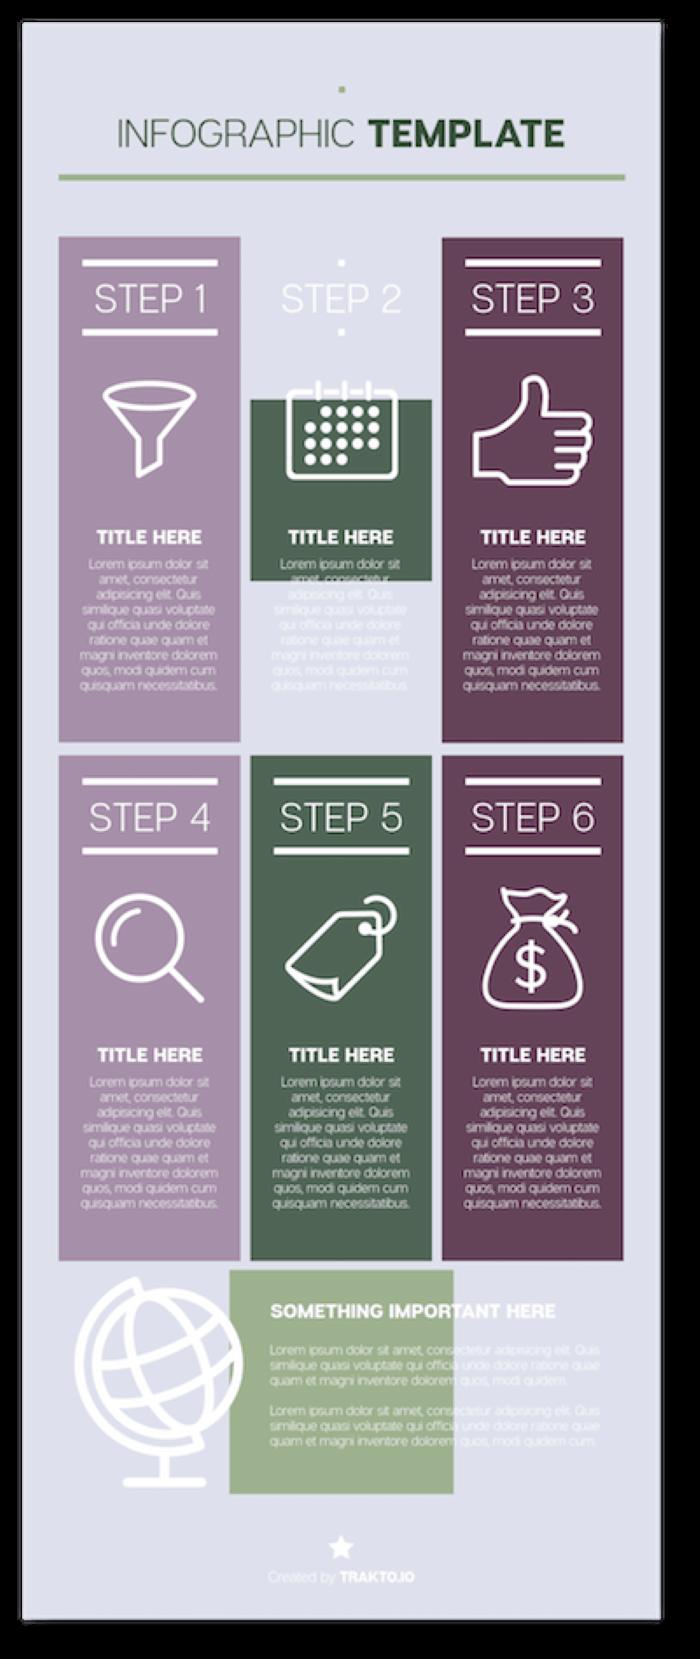 comoconstruirinfograficos12 - Como construir infográficos surpreendentes para o seu negócio?